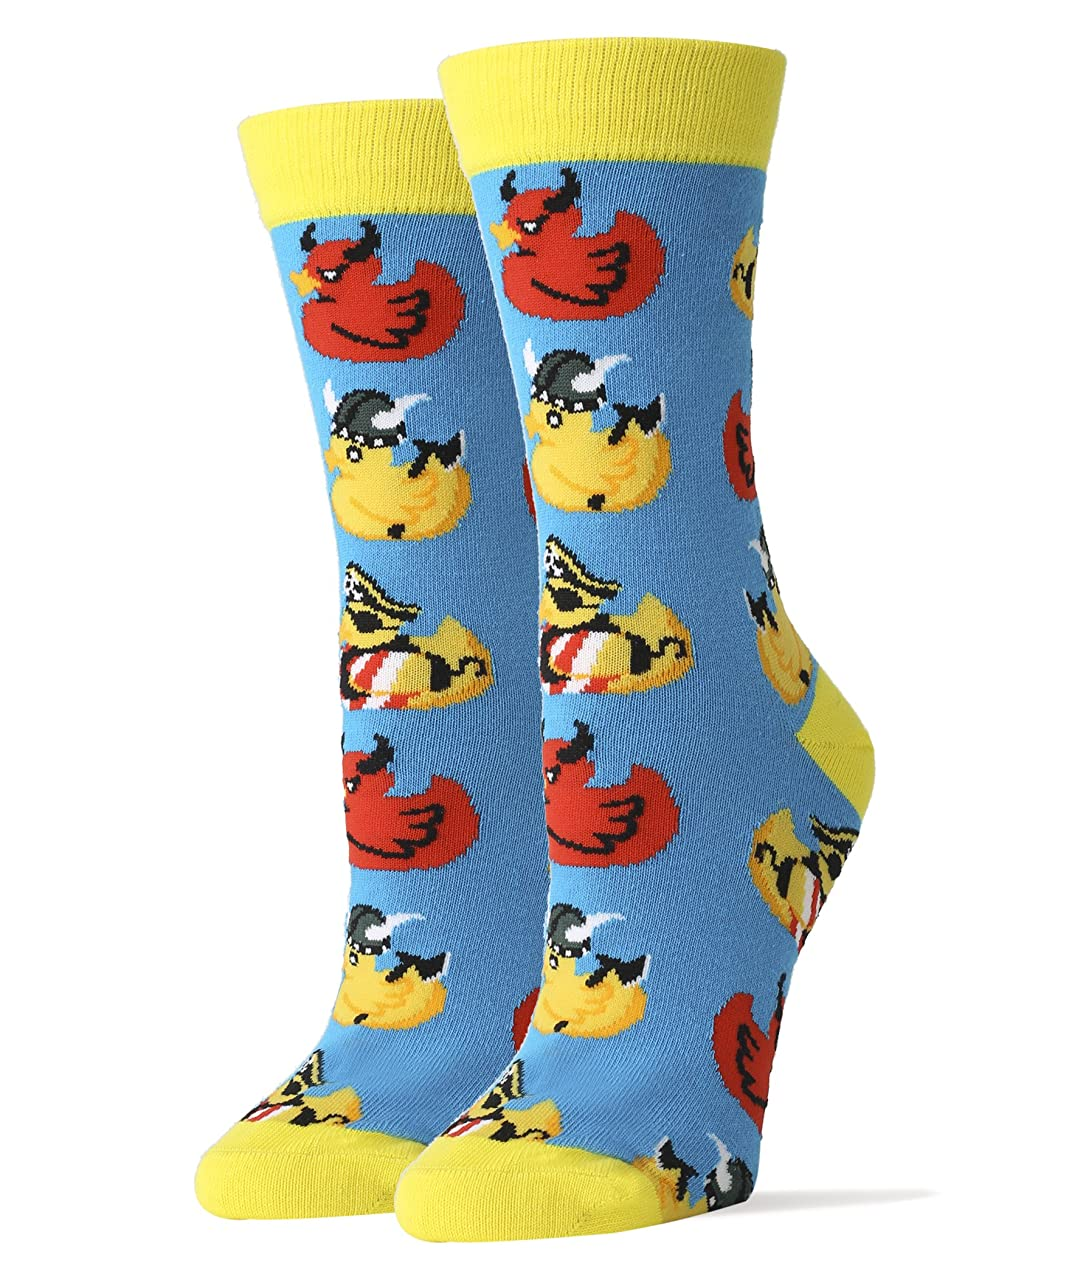 Oooh Yeah Socks ! - Womens Crew - Rub a Dub